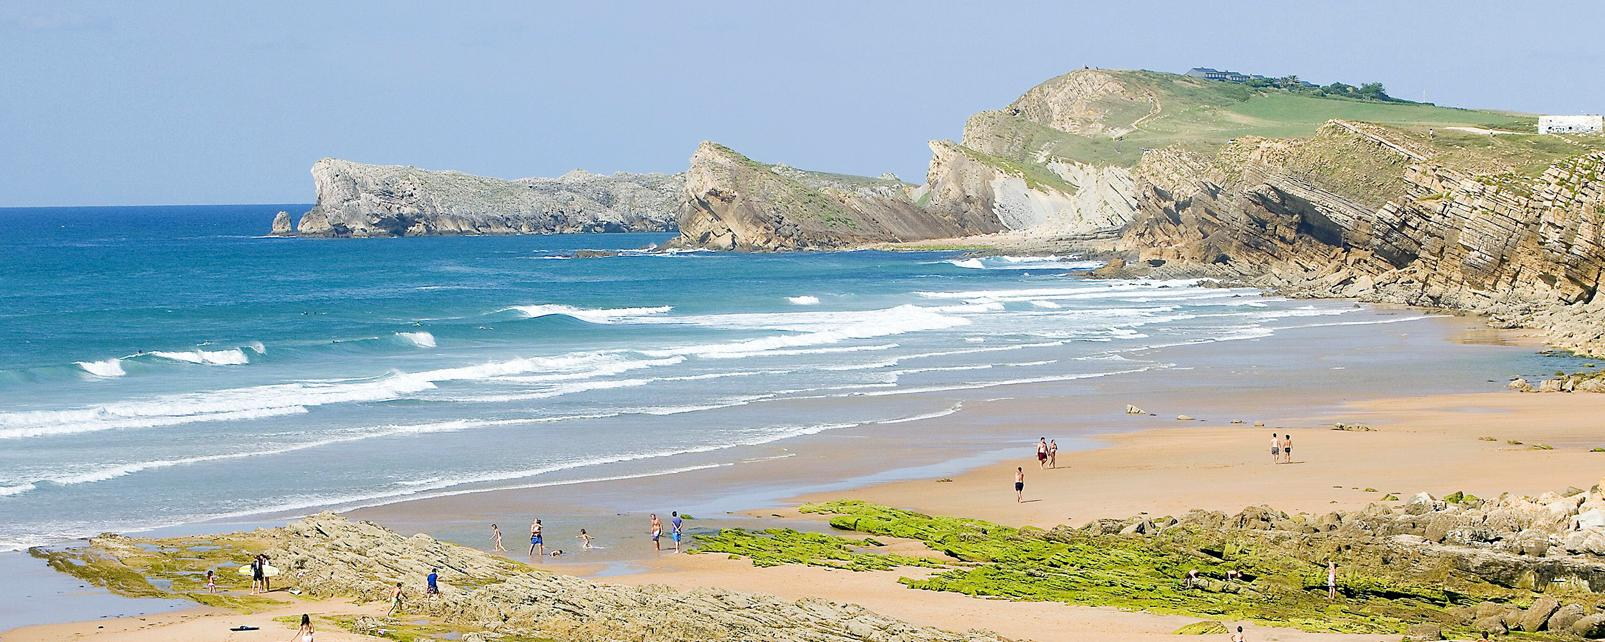 Europe, Espagne, Cantabrie, plage, Valdearenas, rocher, baignade, mer, détente, sable,